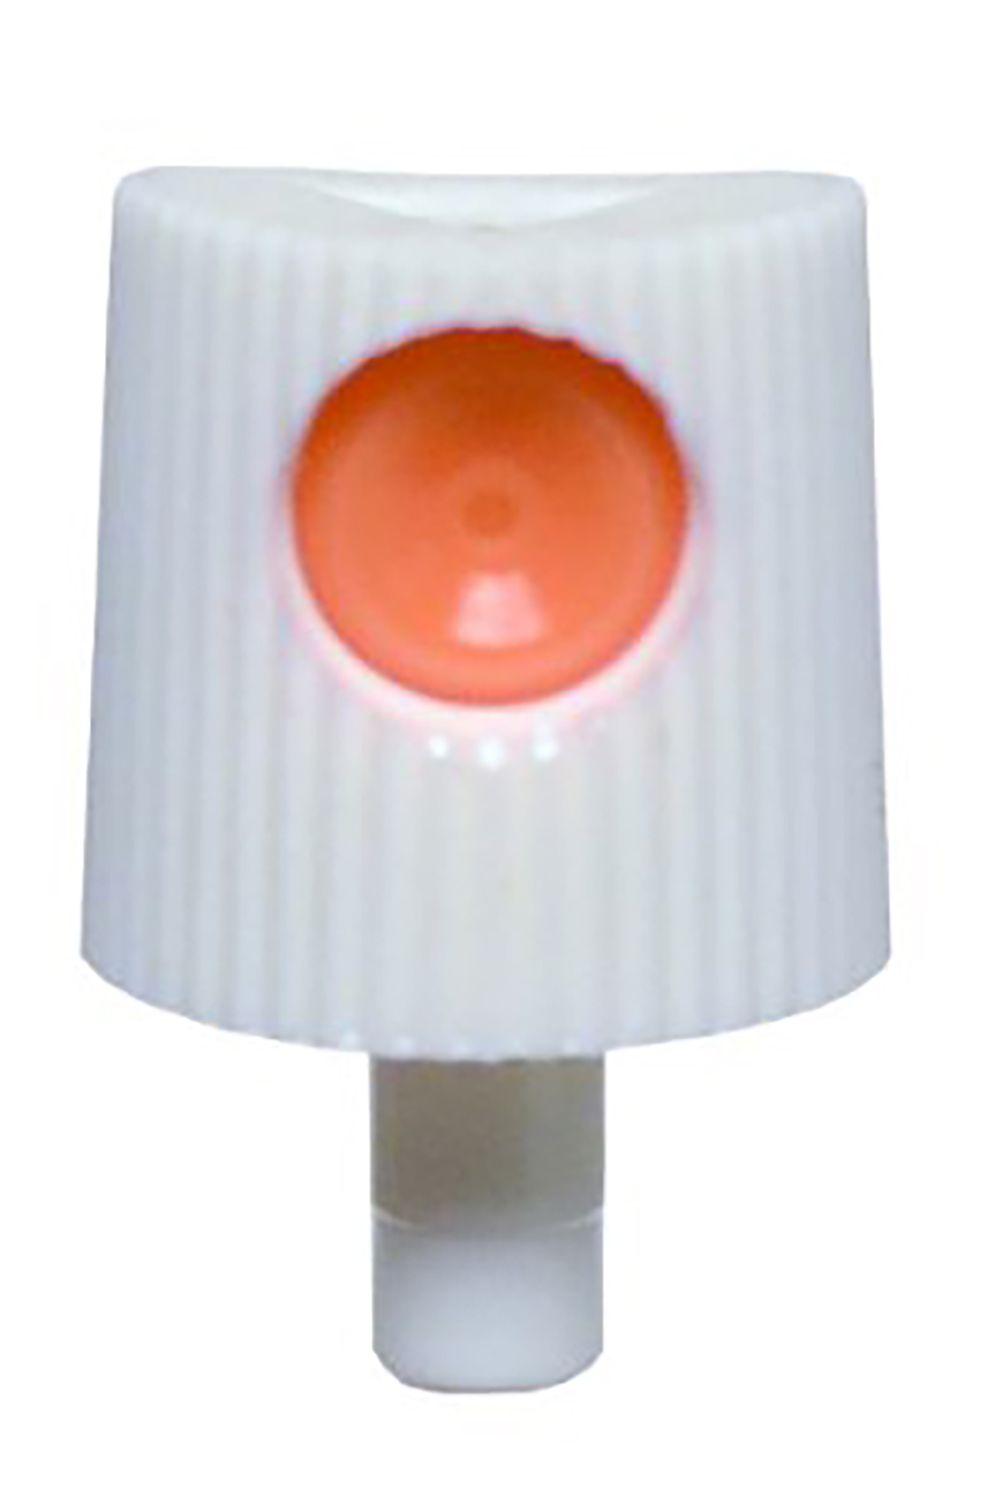 Difusores/Cap Spray Montana NEW YORK RUSTO FAT CAP Assorted